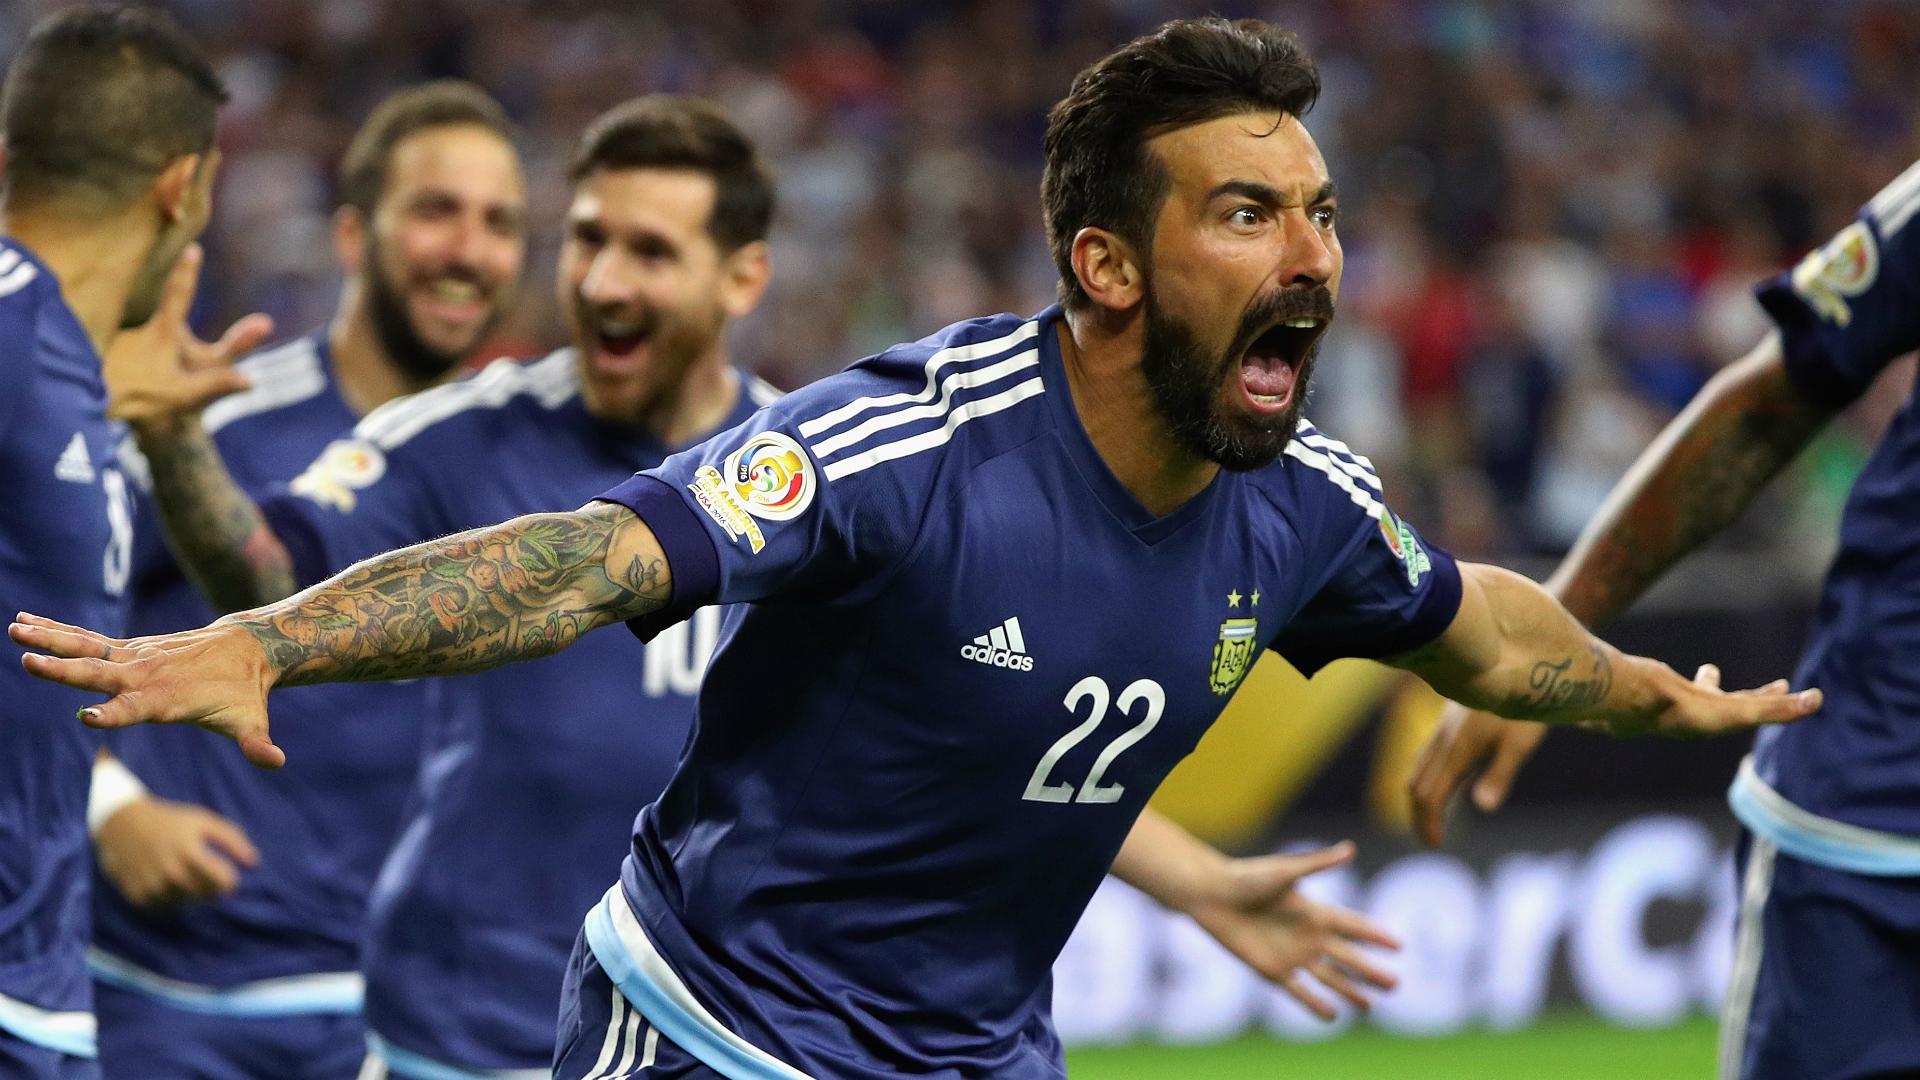 Former PSG and Napoli star Lavezzi announces retirement